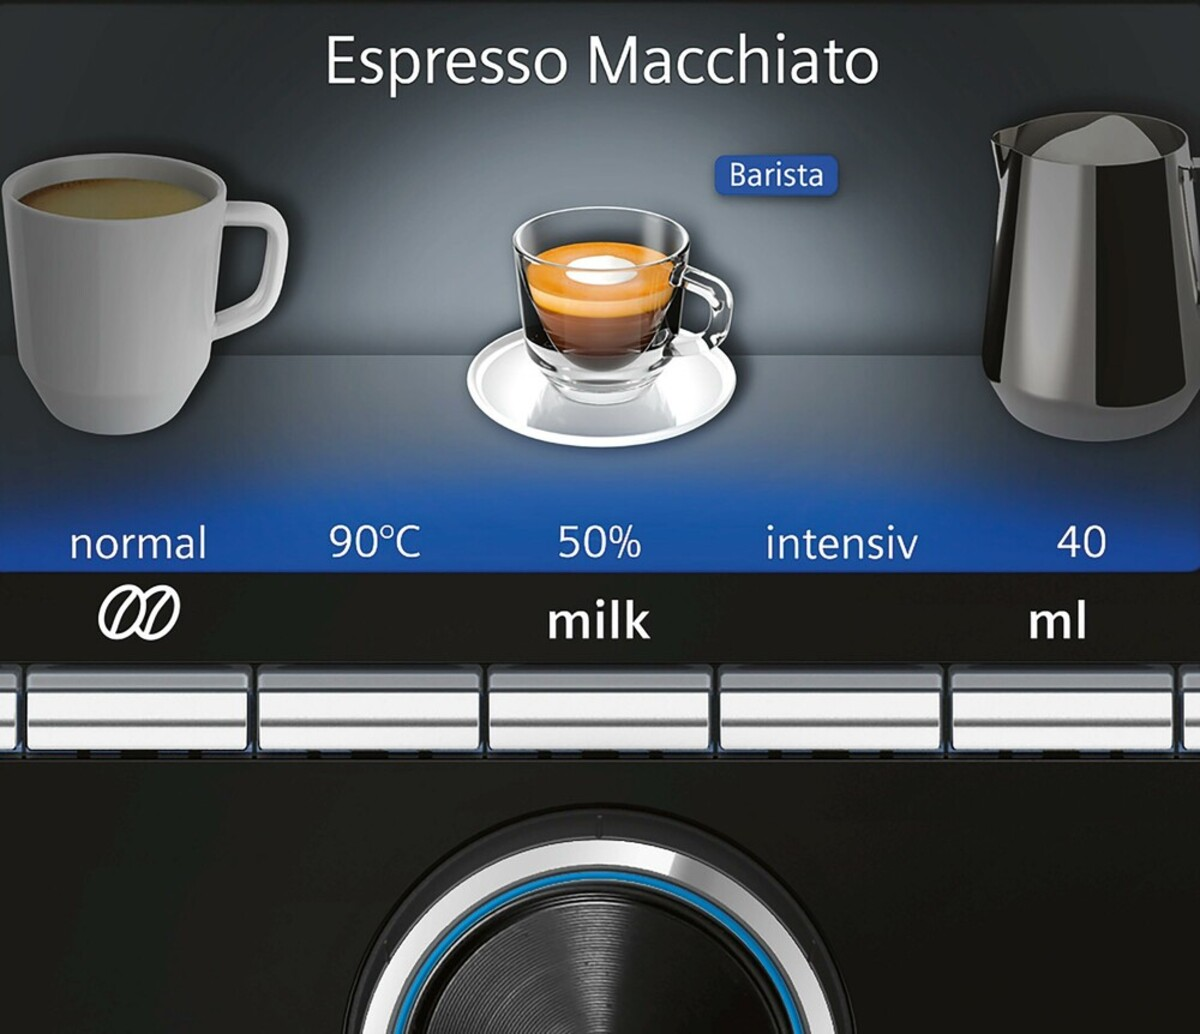 Bild 5 von EQ.9 plus connect s500 TI9558X1DE Edelstahl Kaffeevollautomat